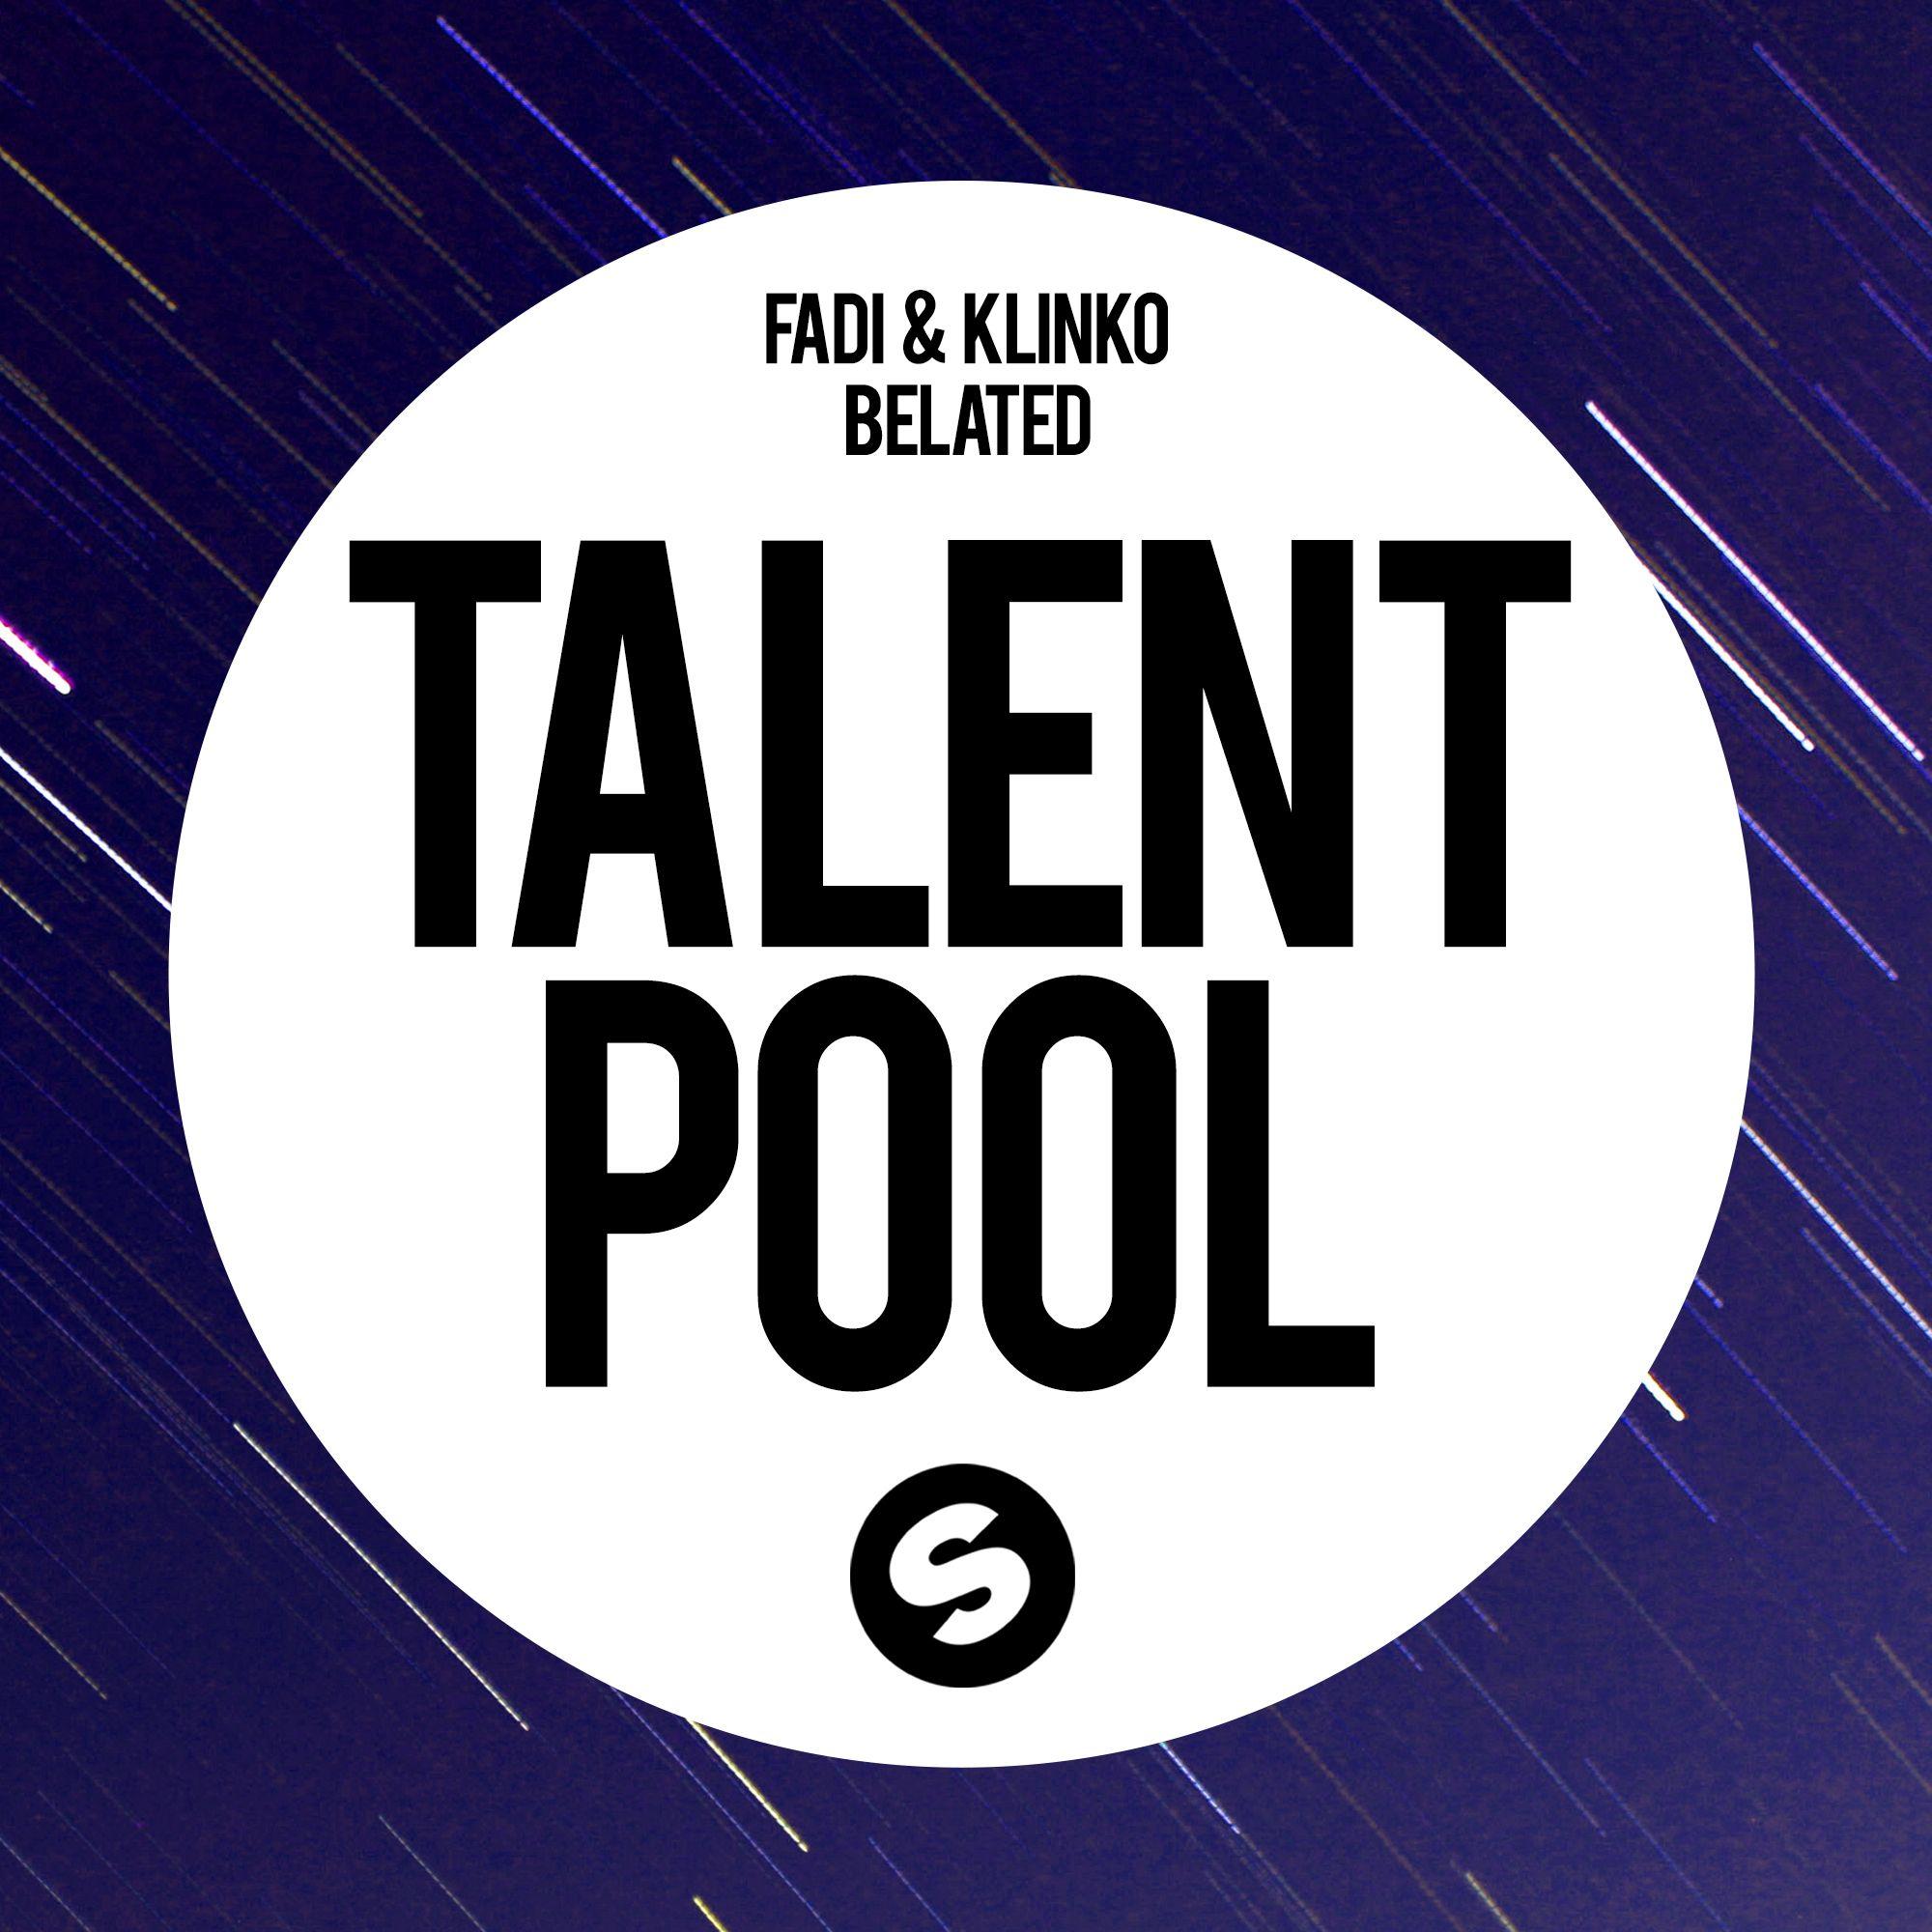 talentpool_fadi_klinko_-_belated.jpg